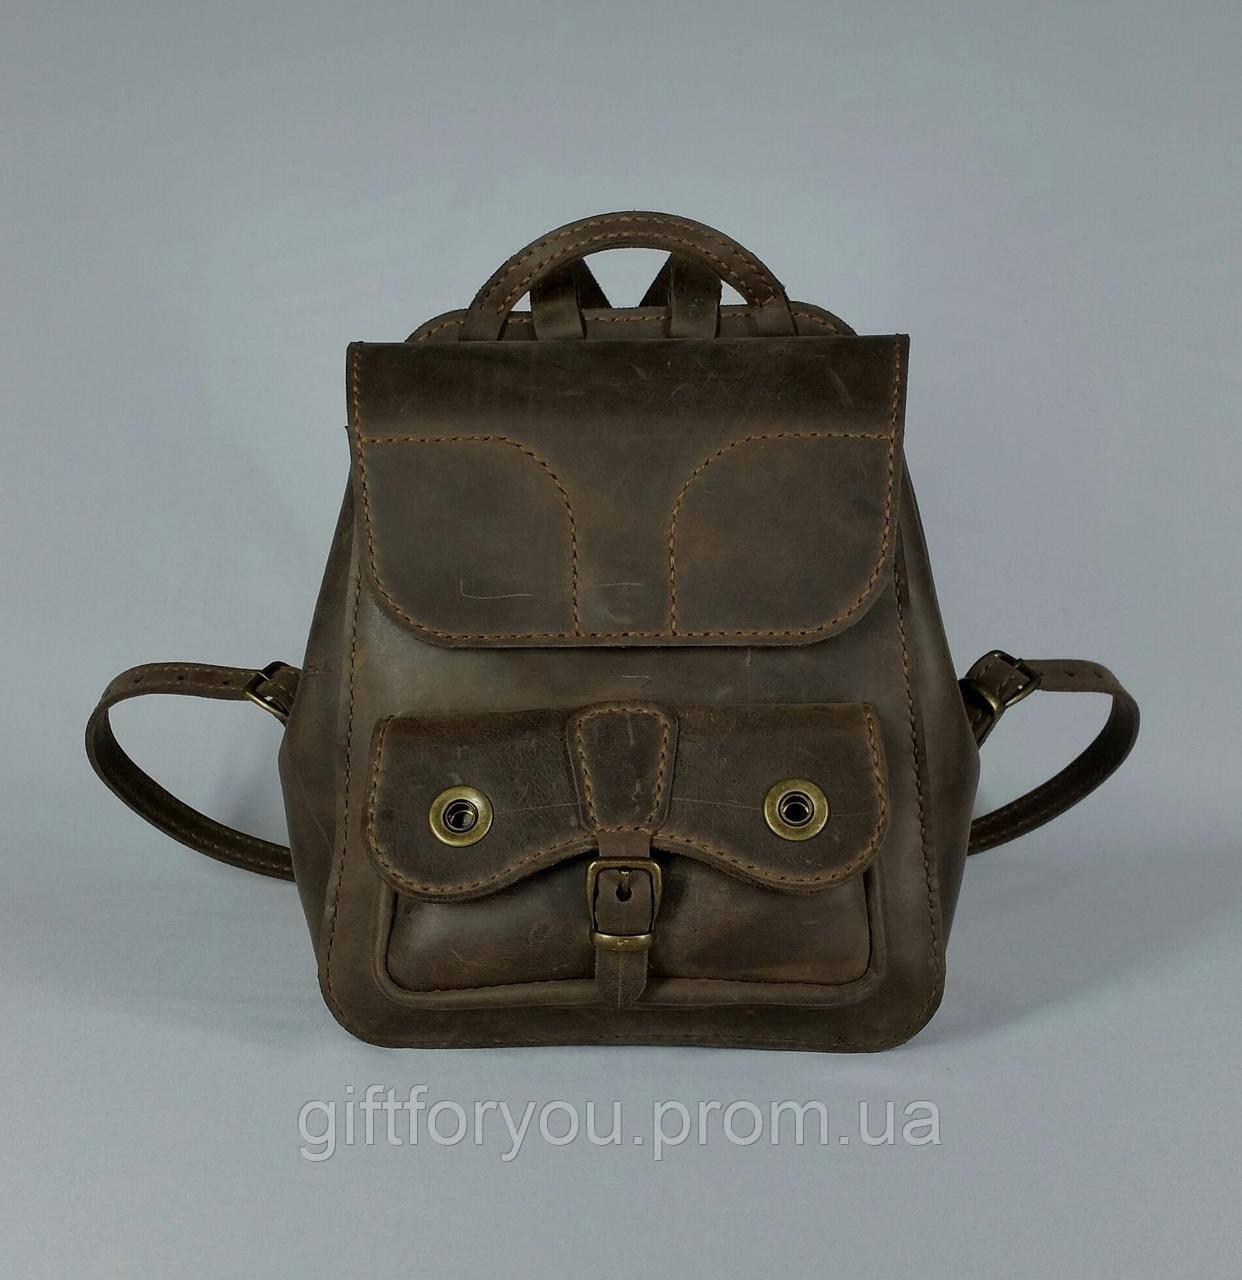 1bfb0e0f894b Рюкзак унисекс, натуральная кожа, ручная работа 23*20см.: продажа ...